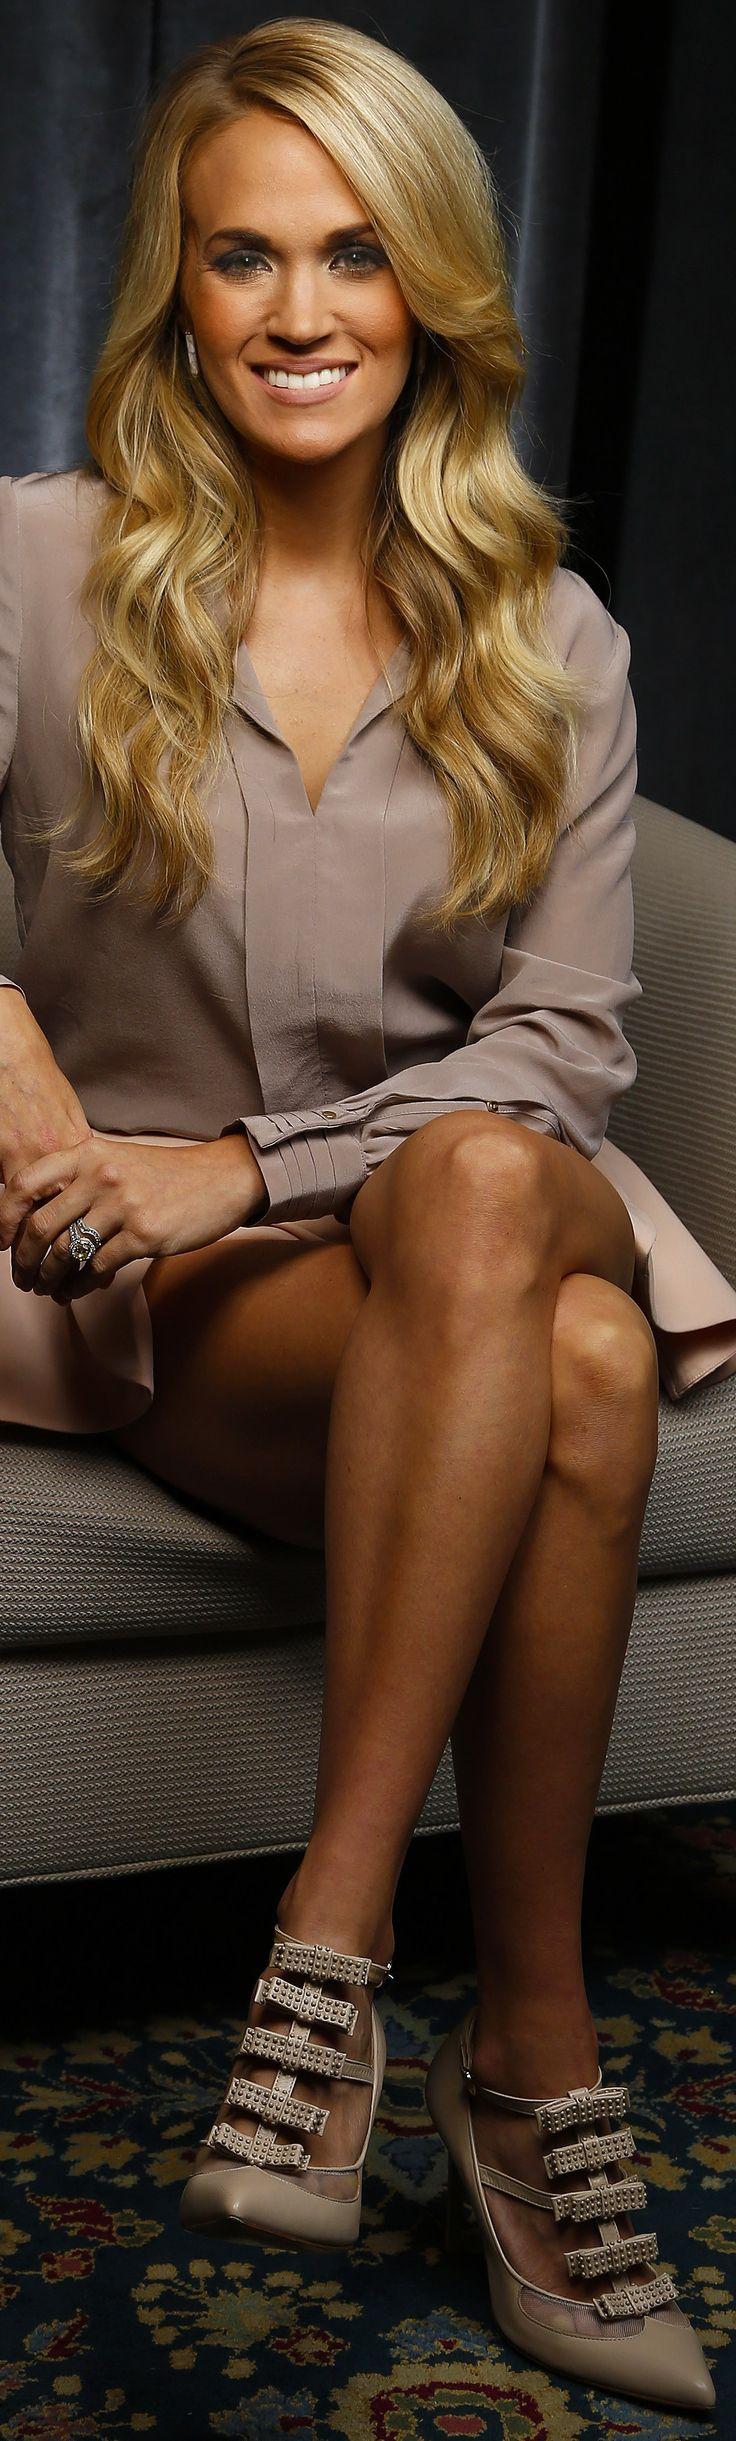 Carrie Underwood Ass Pics 19